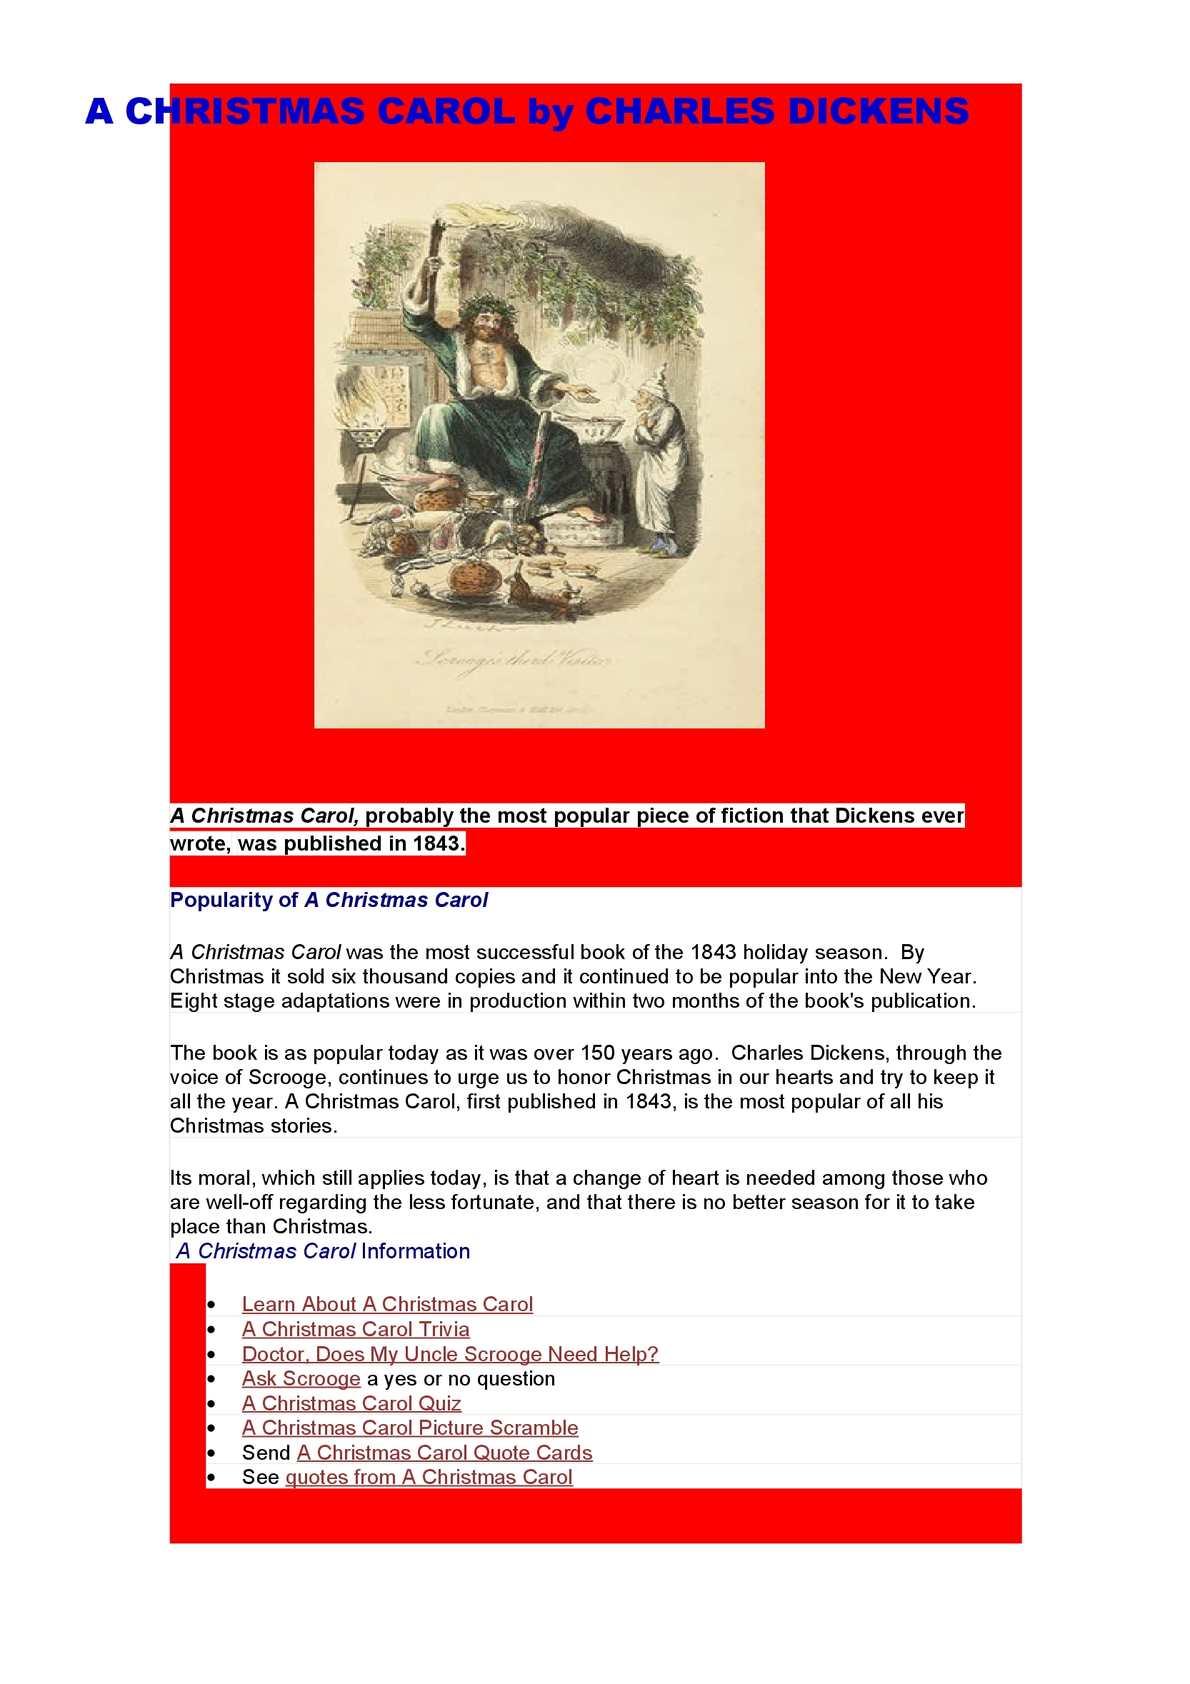 Christmas Carol Trivia.Calameo A Christmas Carol By Charles Dickens